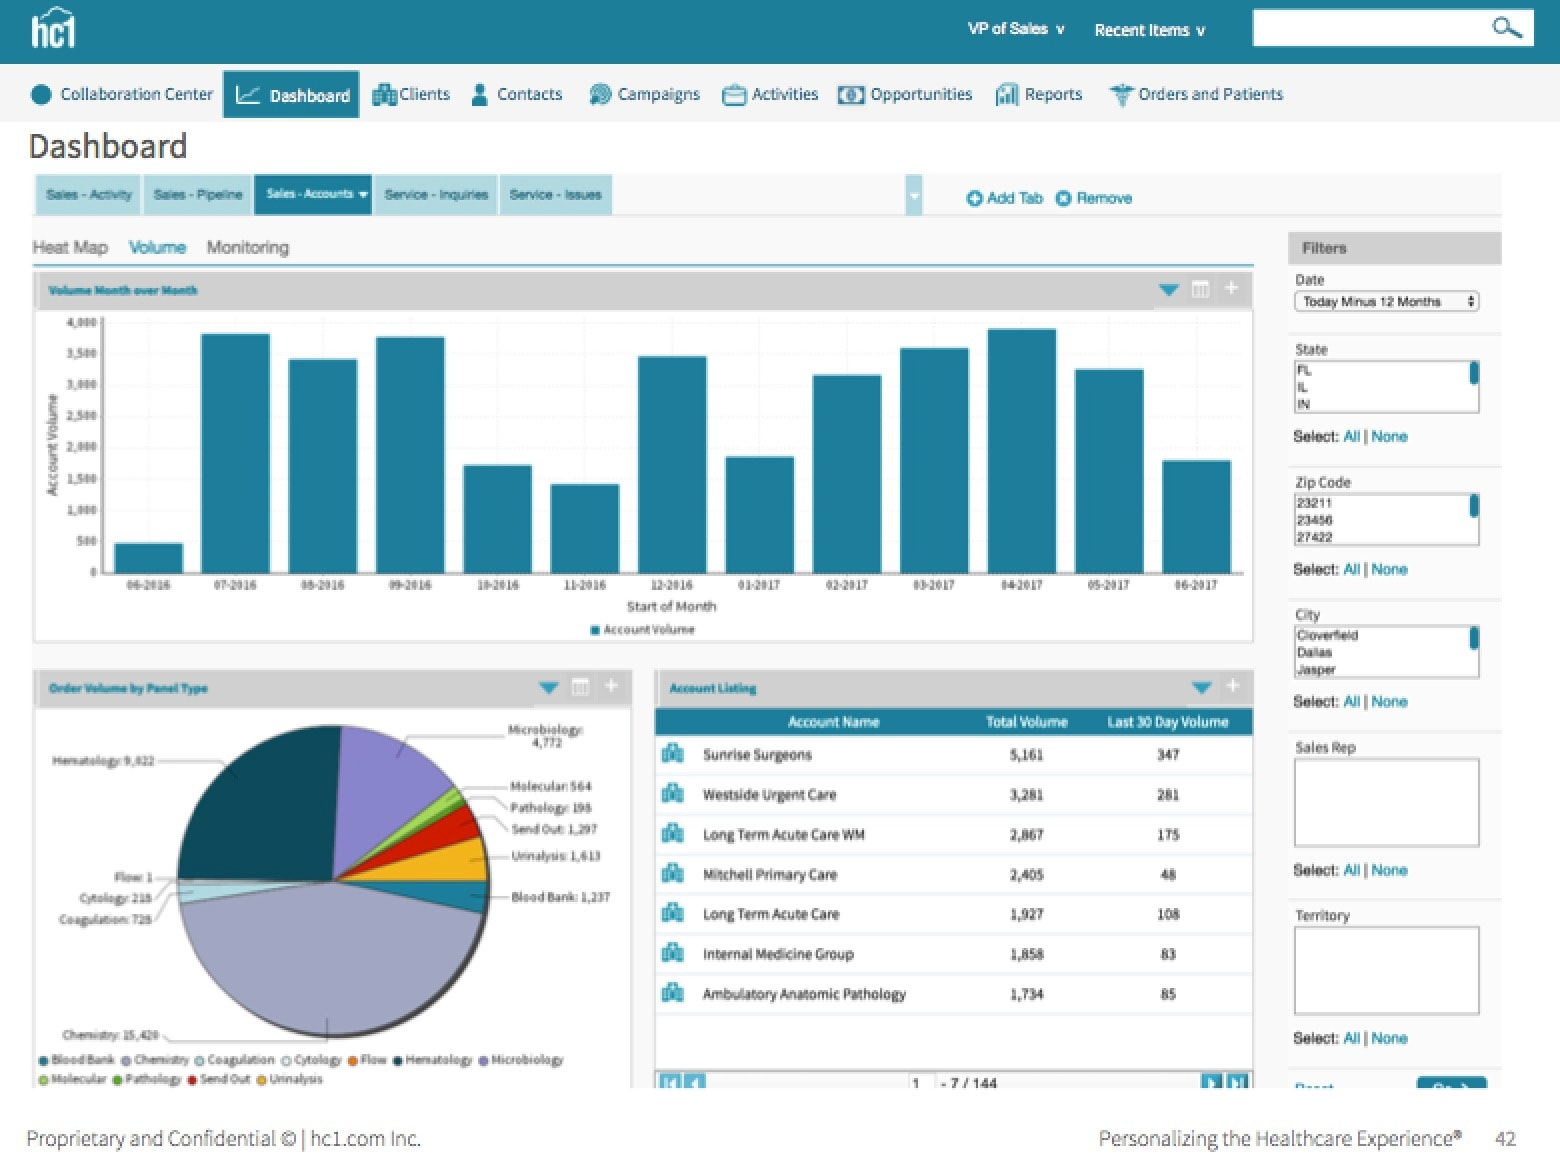 Sales account - volume dashboard